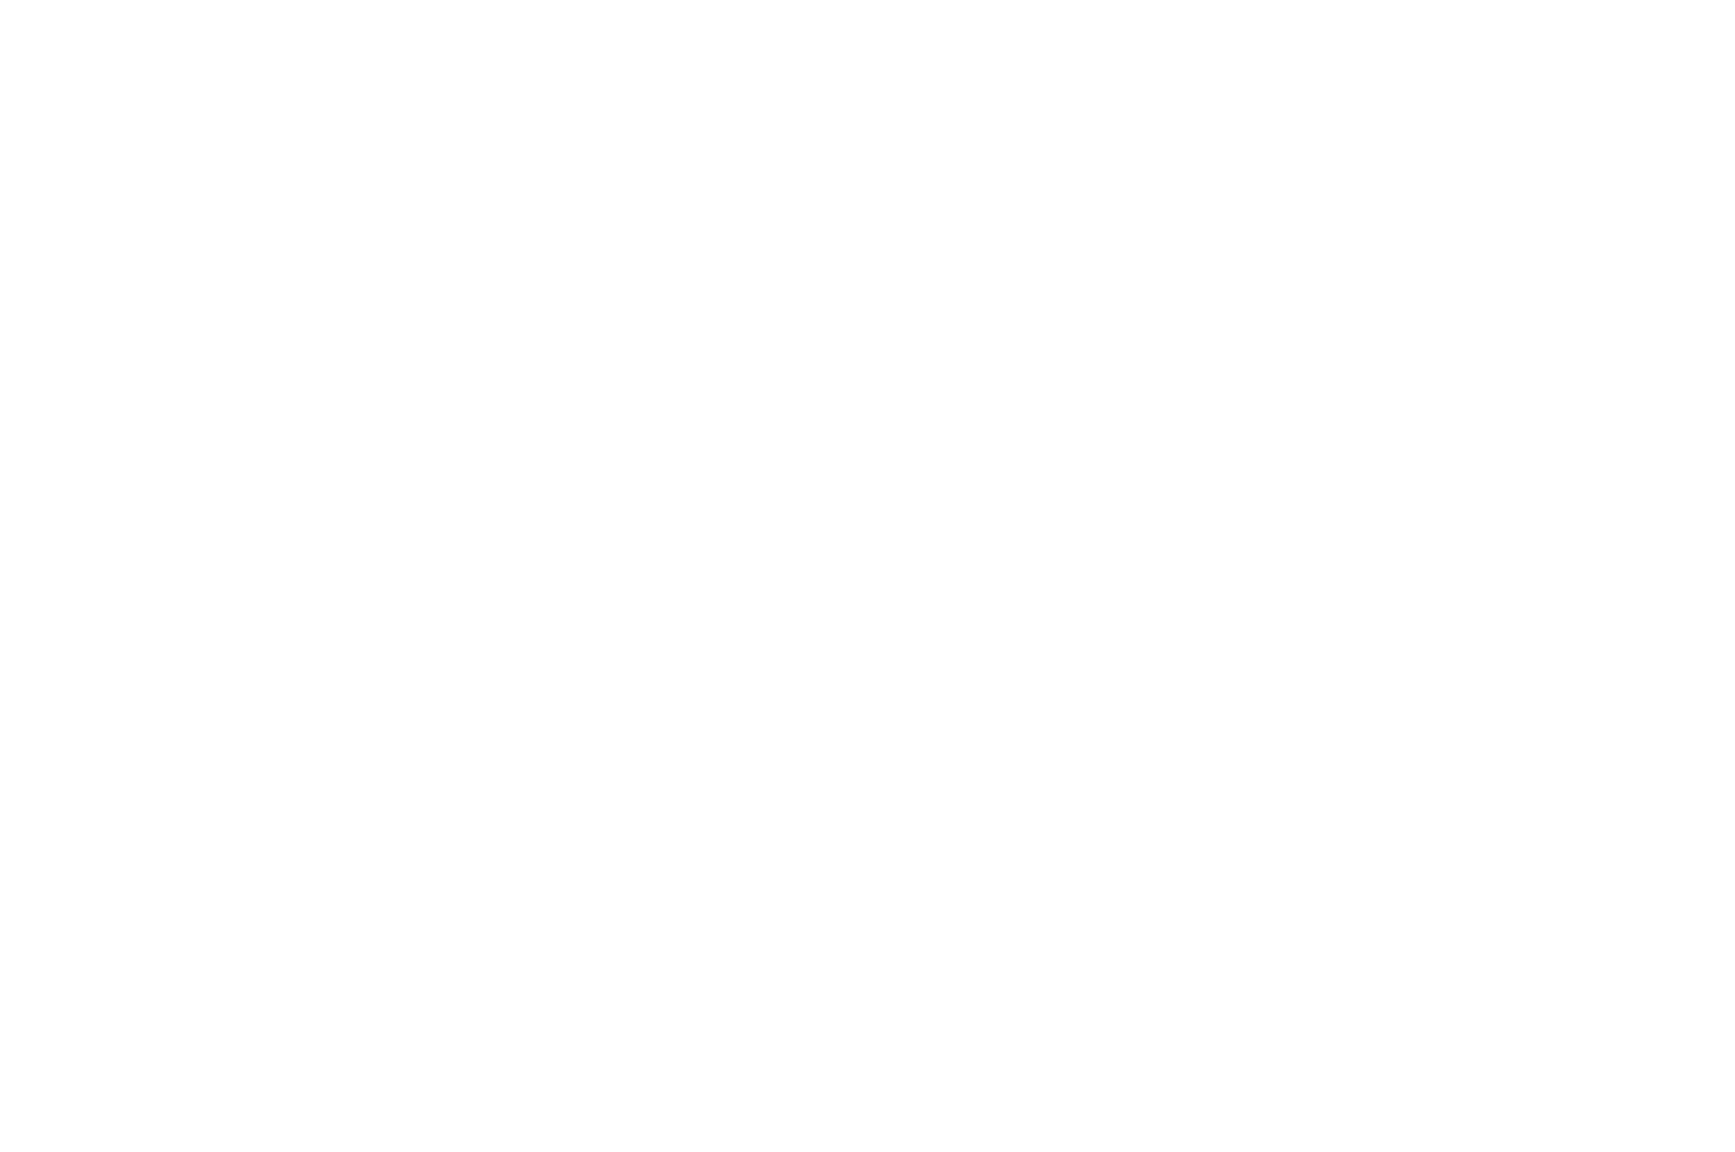 AWARD WINNING - BEST FILM - 2018-2.png